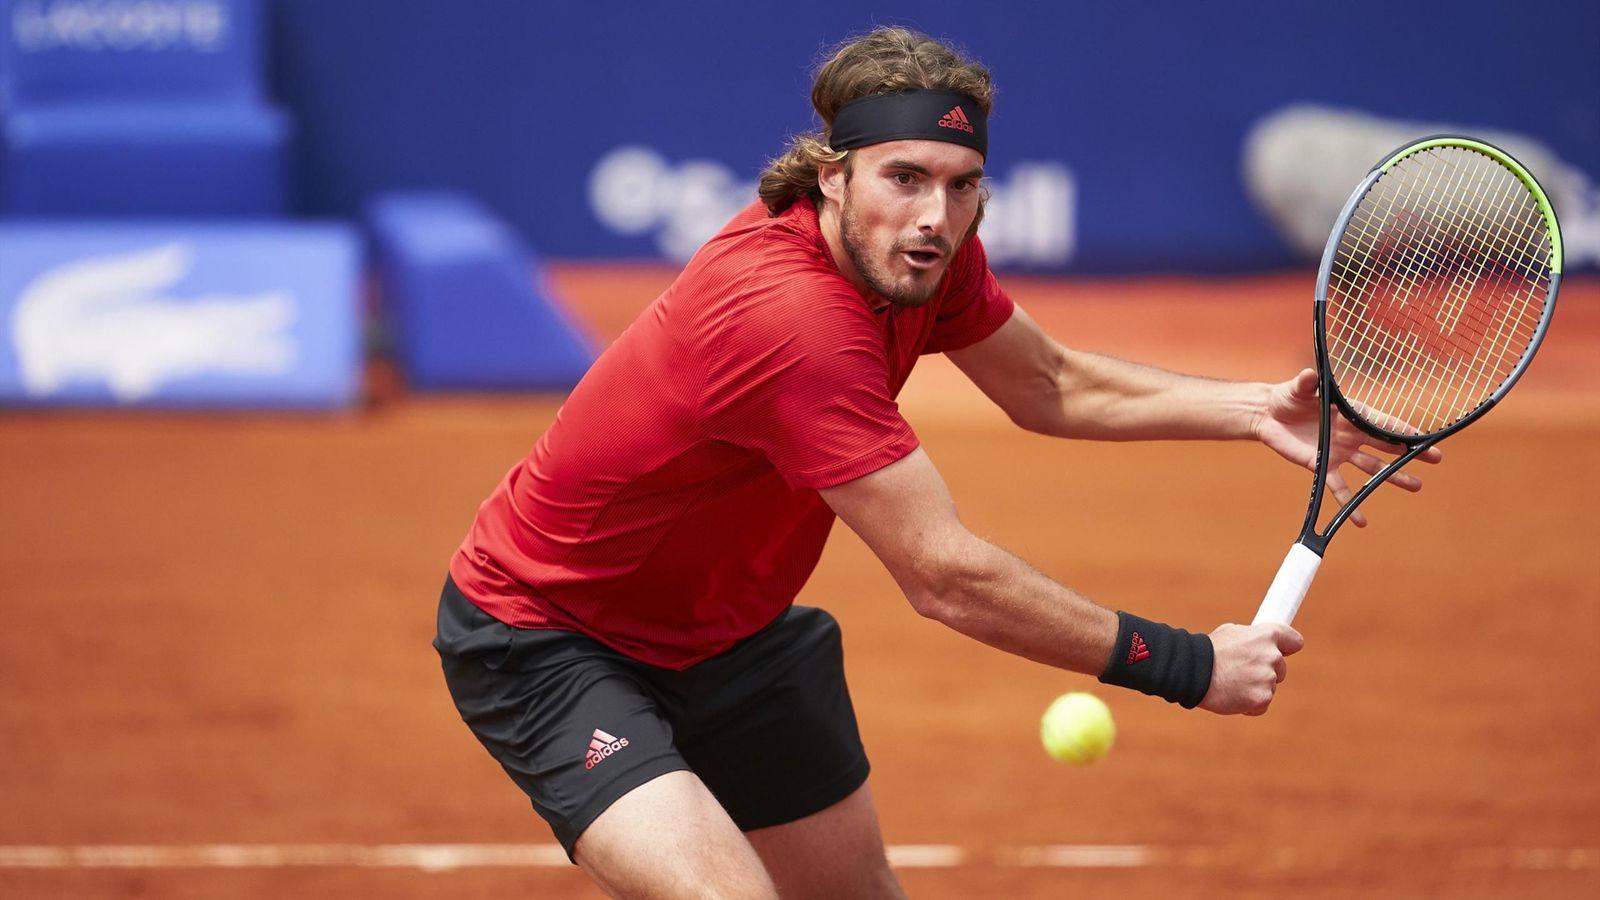 Barcelona Open 2021: Stefanos Tsitsipas vs. Jannik Sinner Tennis Pick and Prediction